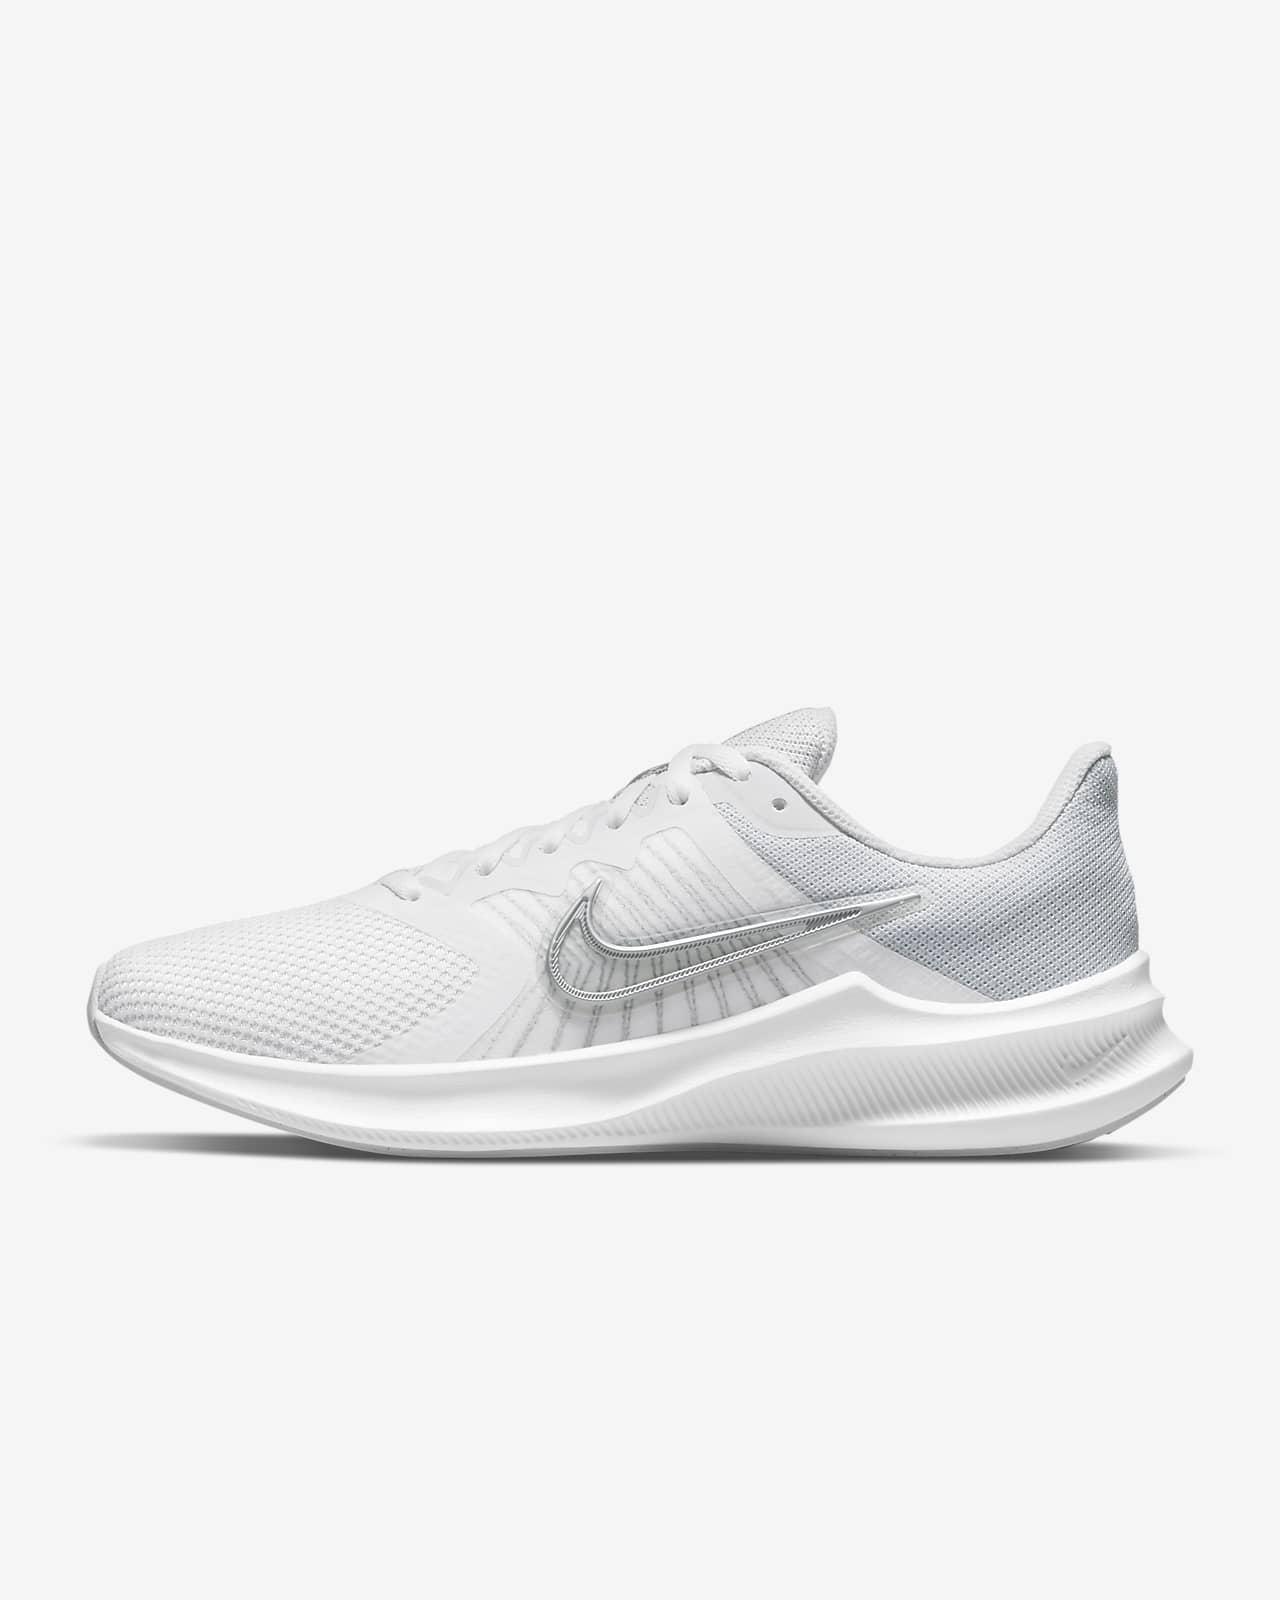 Sapatilhas de running Nike Downshifter 11 para mulher